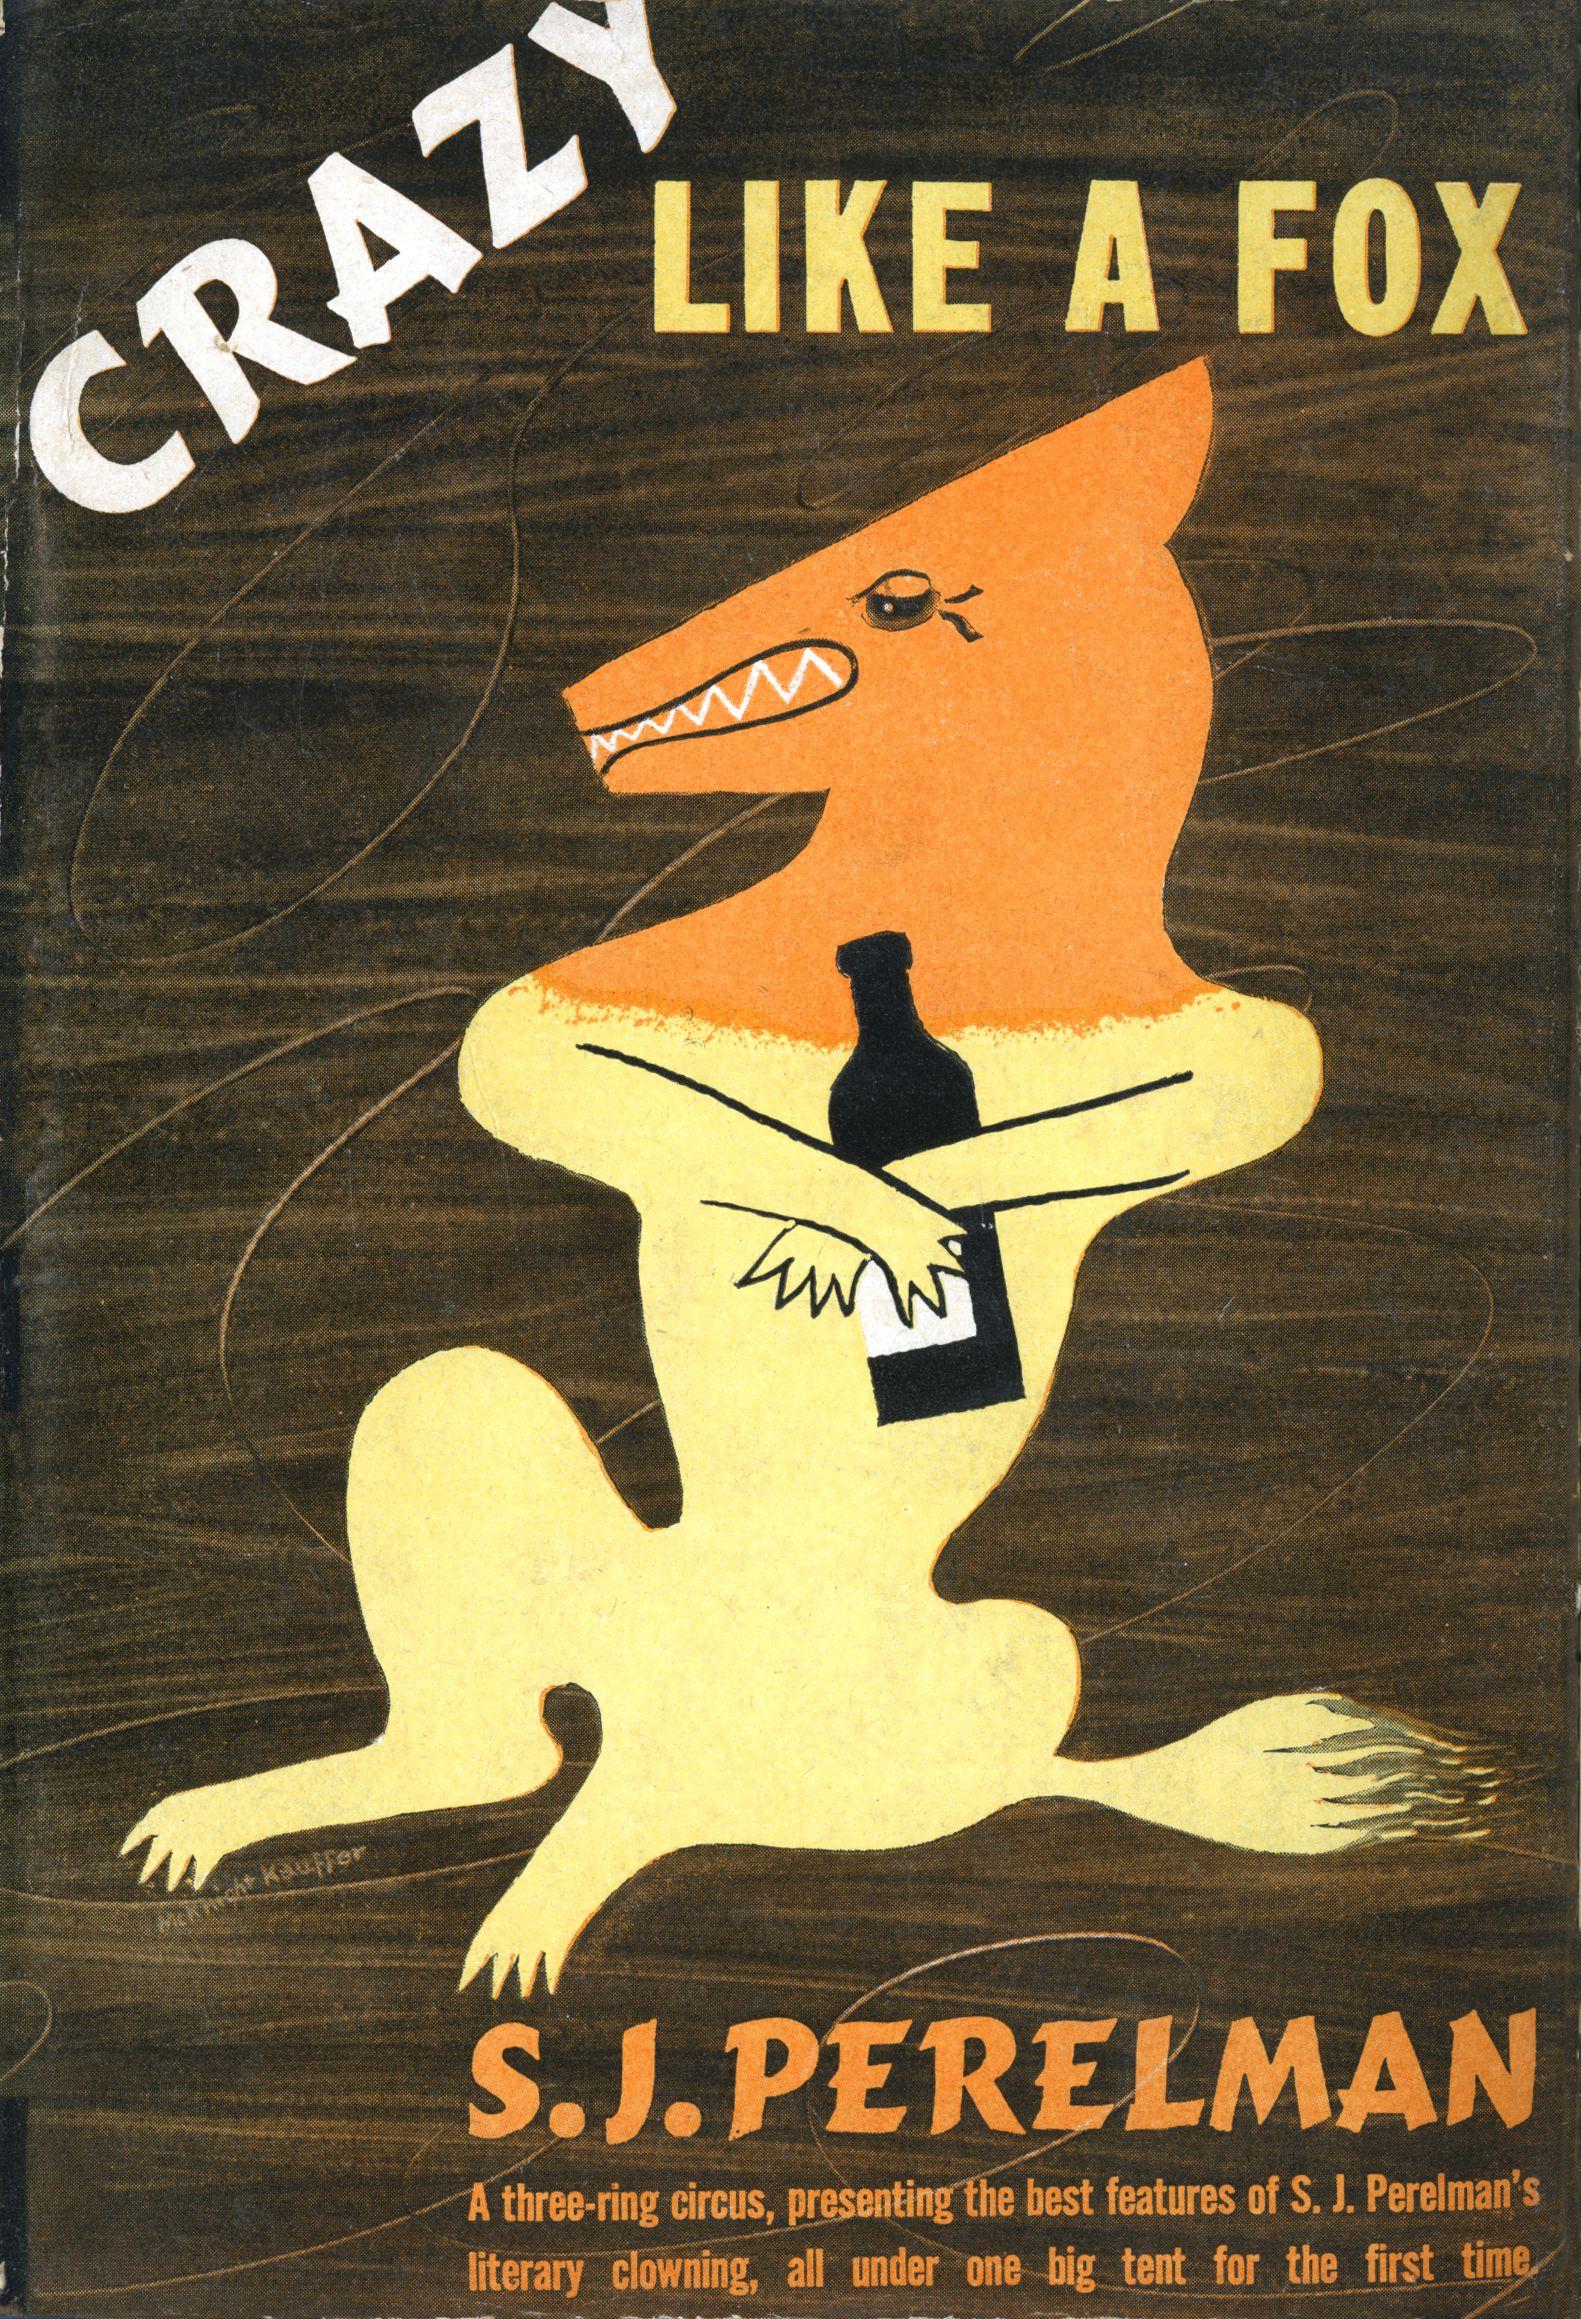 22 Amazing Edward McKnight Kauffer Book Covers | Pinterest | Foxes ...